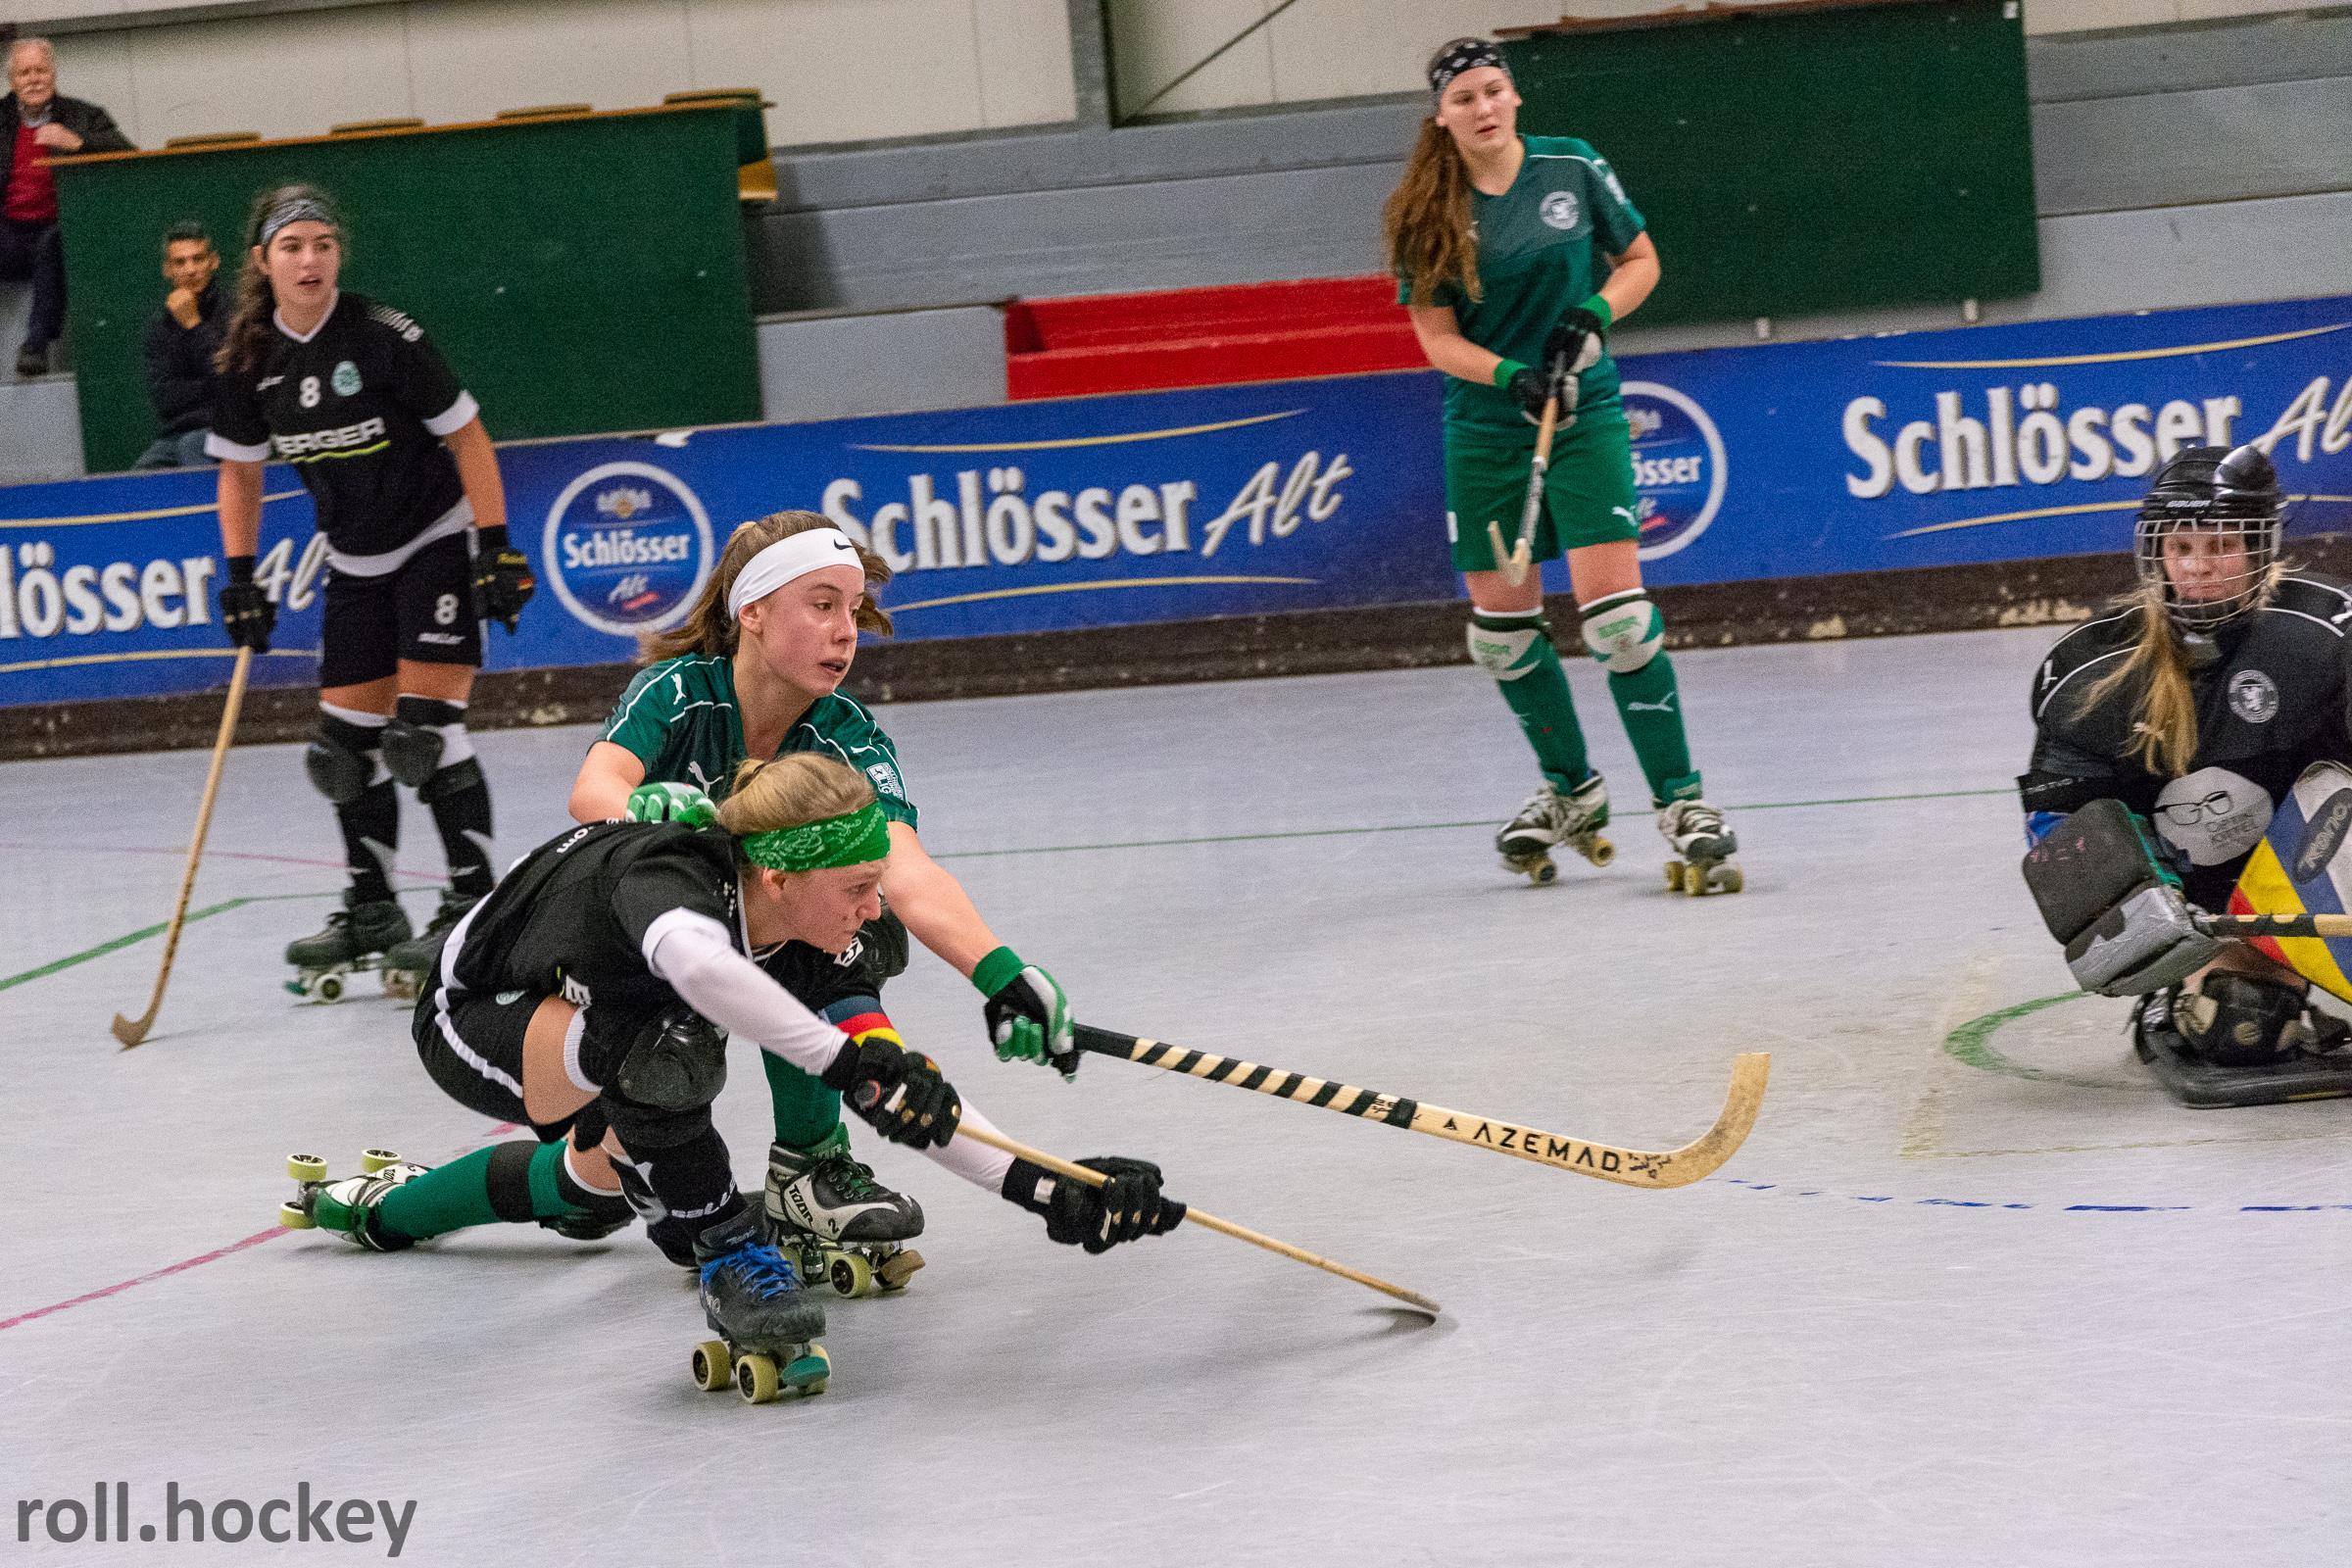 RSC Cronenberg Rollhockey Bundesliga Damen Spieltag 12.01.2019